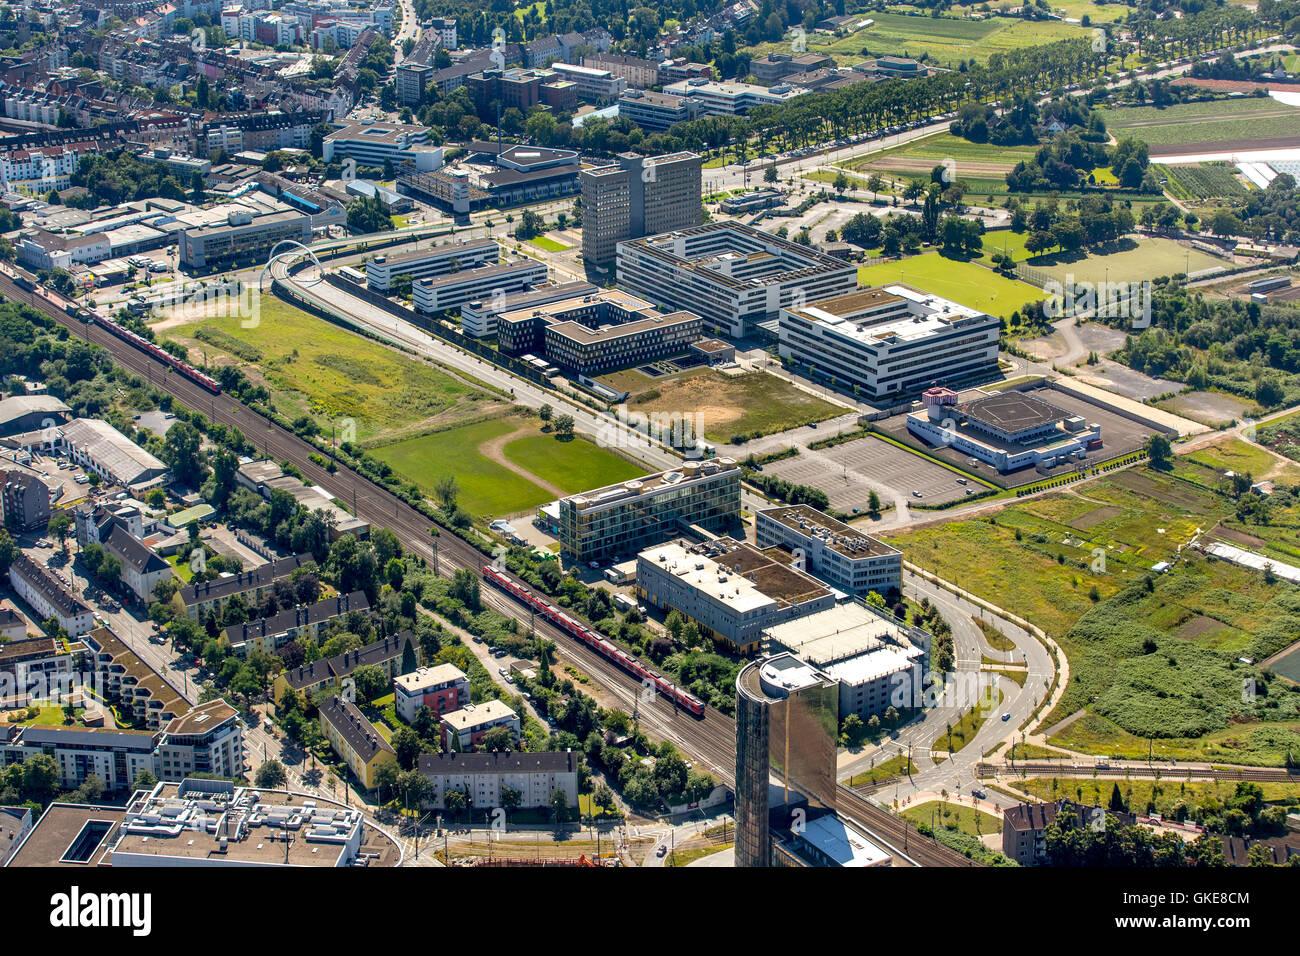 Aerial view, State Criminal Office North Rhine-Westphalia with helipad, Dusseldorf, Rhine country, north rhine-westphalia, - Stock Image